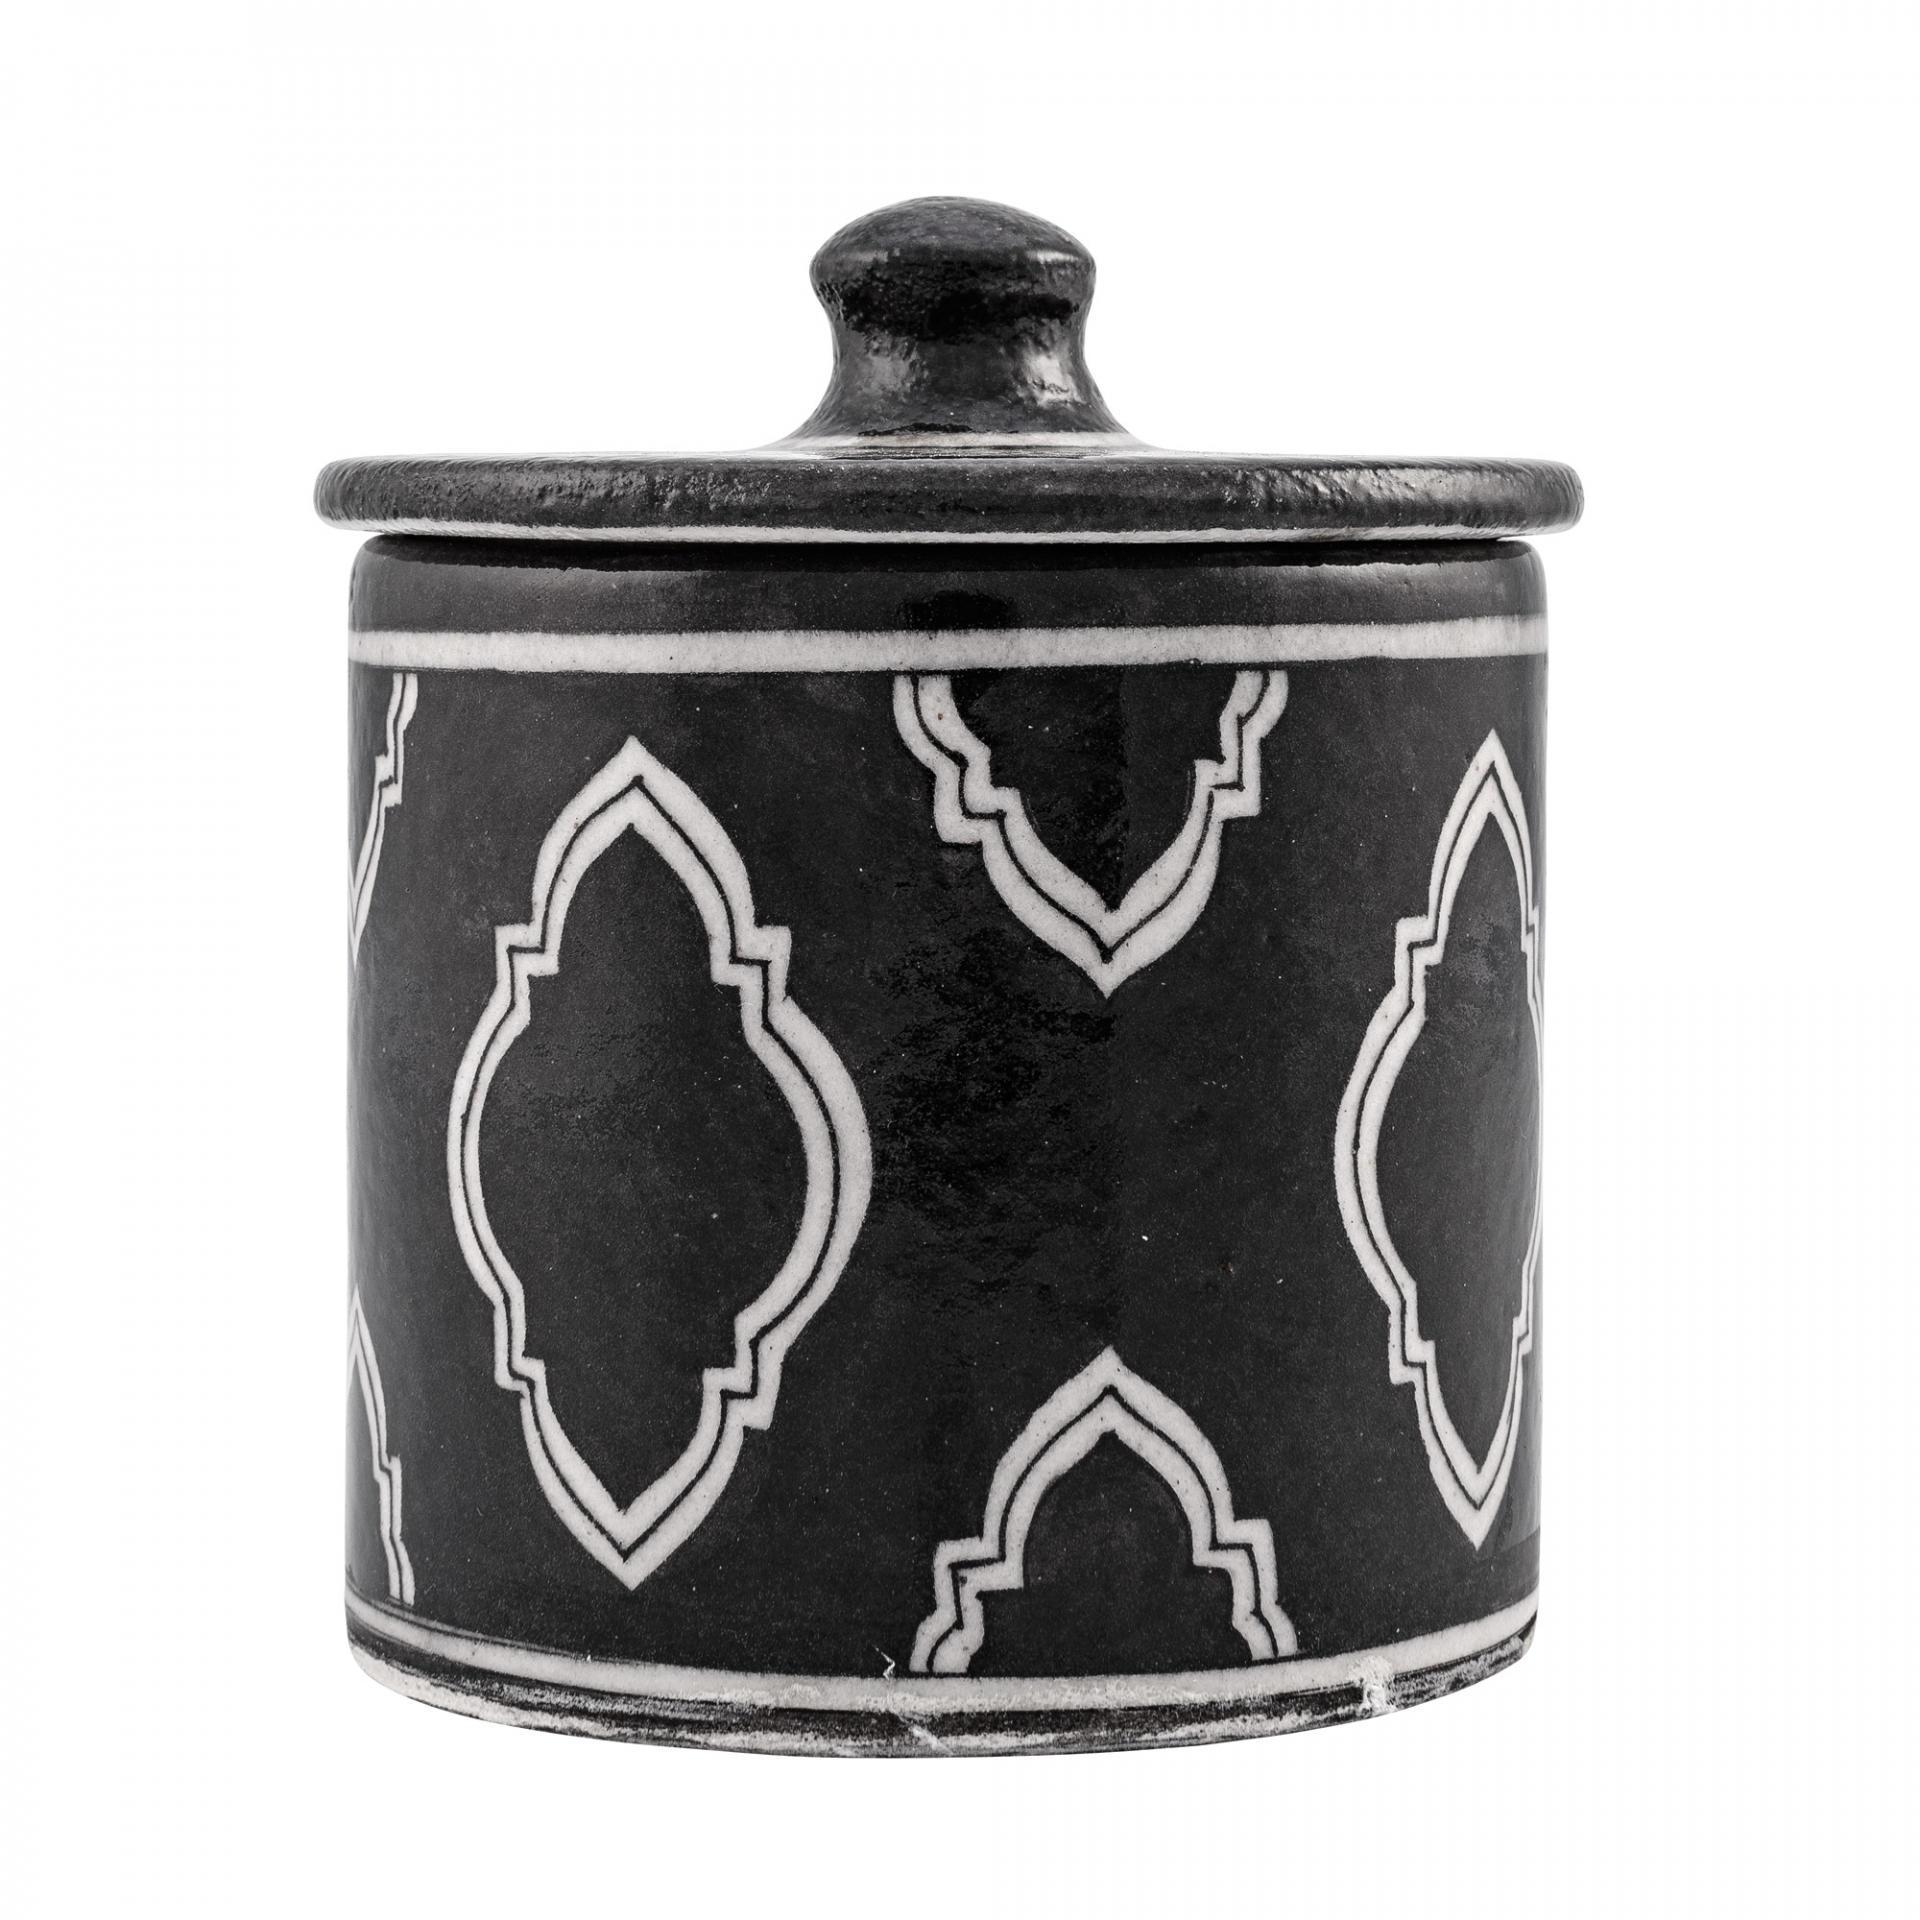 Keramická dózička do koupelny Handpainted, černá barva, bílá barva, keramika